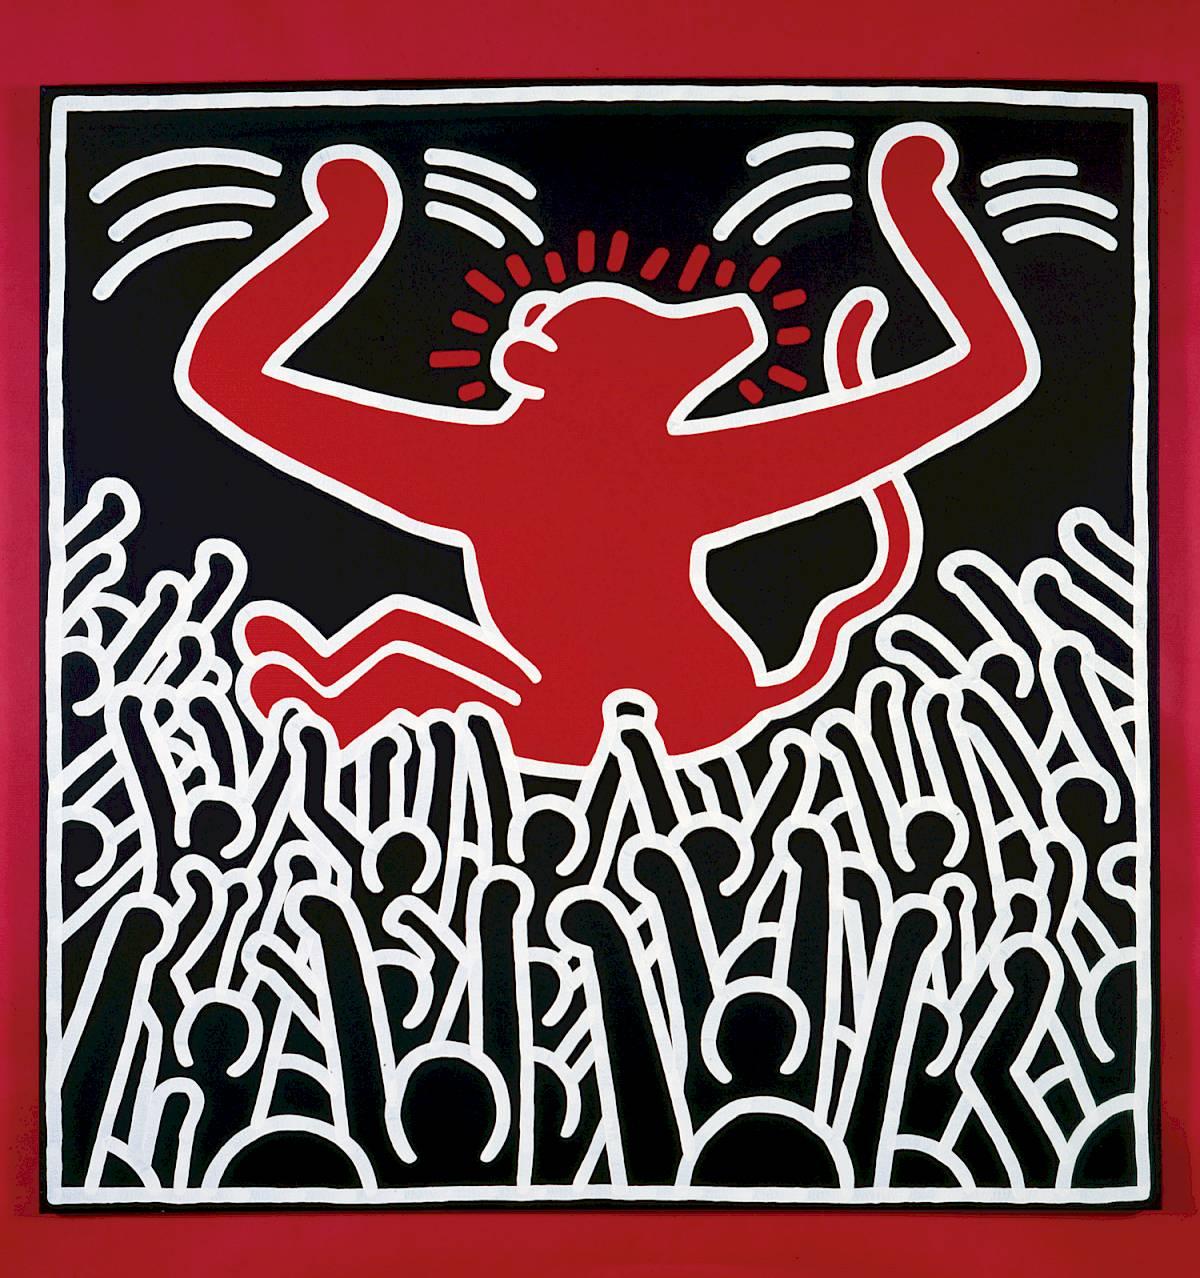 Keith Haring, sans titre, 1985 ©Keith Haring Foundation